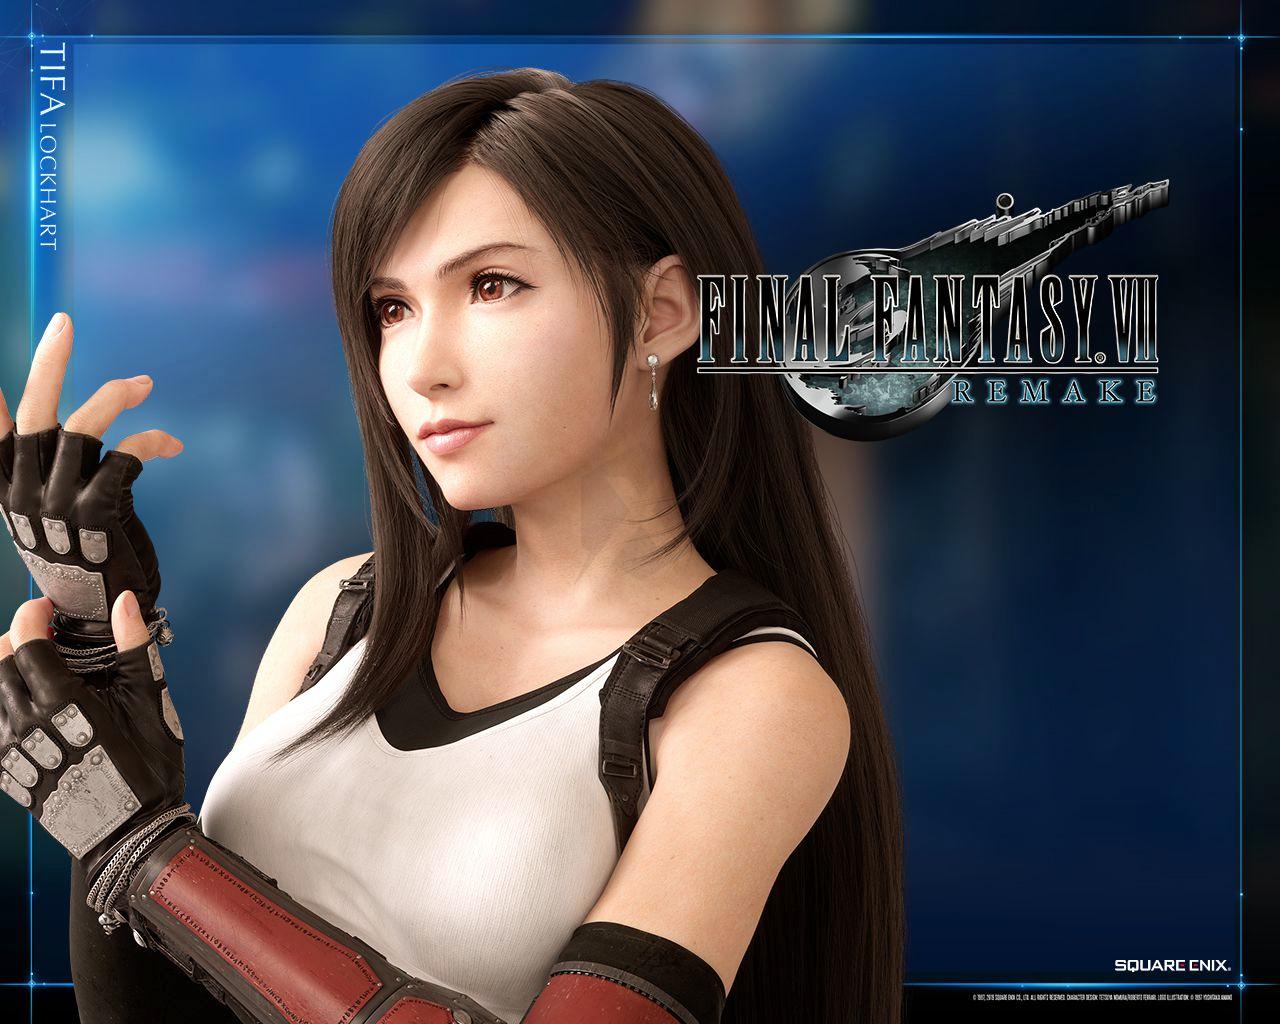 Final Fantasy 7 Remake The Available Set Of Avatars And Wallpapers Dedicated To Tifa Final Fantasy Tifa Lockhart Final Fantasy Vii